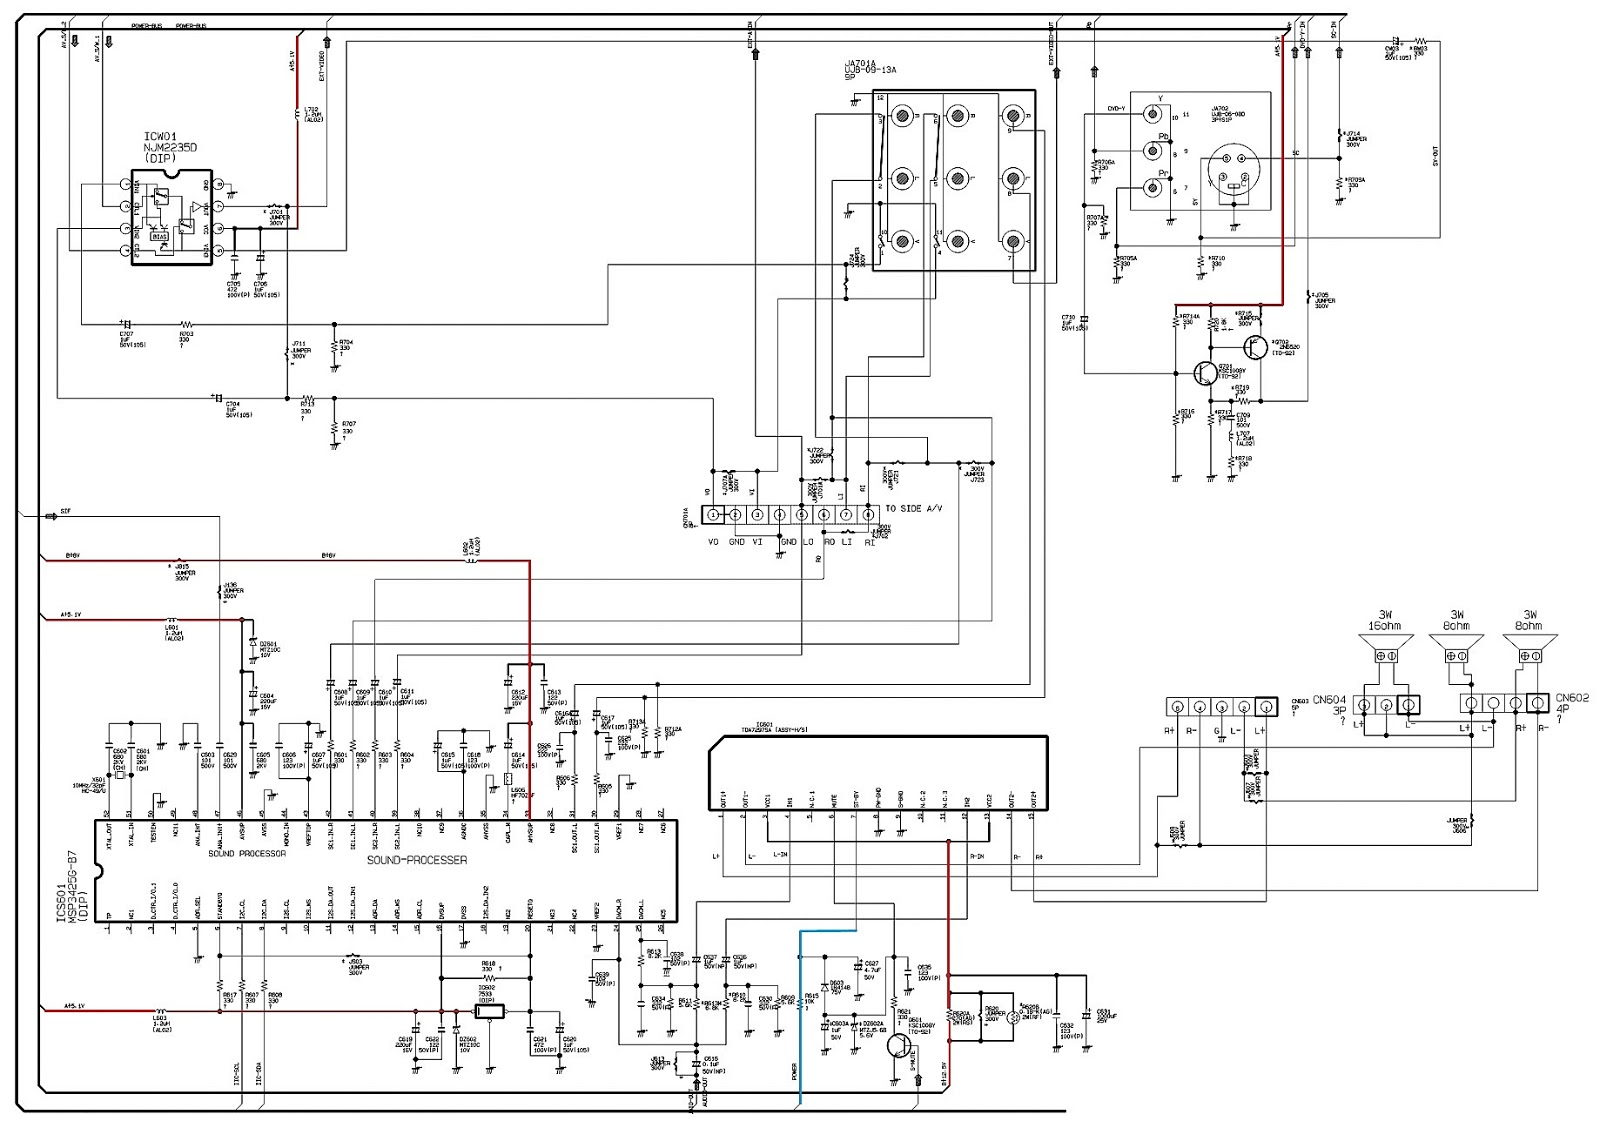 Samsung Nx583g0vbsr Wiring Diagram